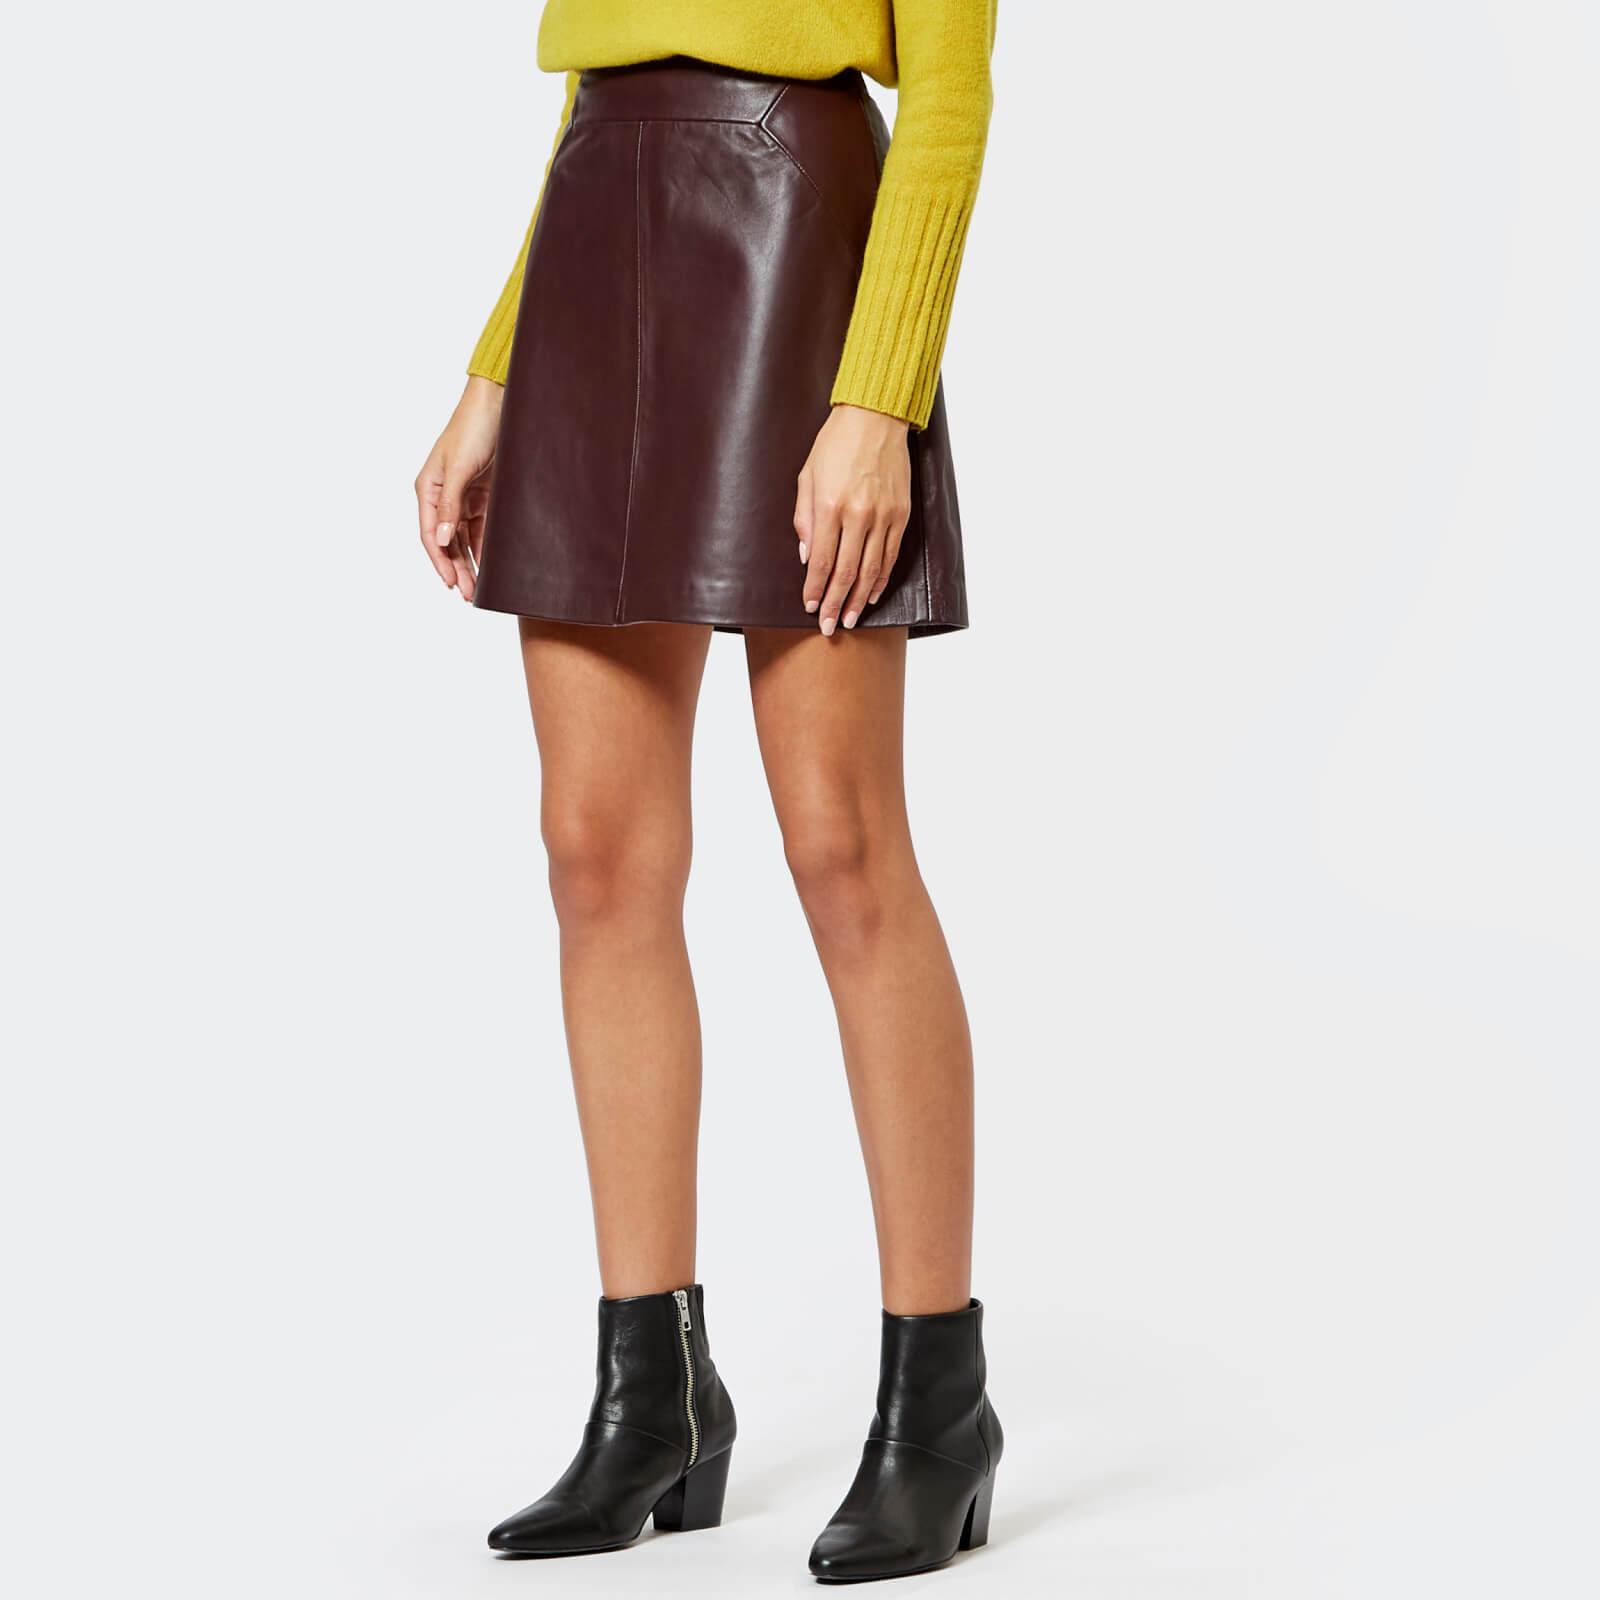 c679c7250 Whistles Women's Leather A-Line Skirt - Burgundy Womens Clothing |  TheHut.com